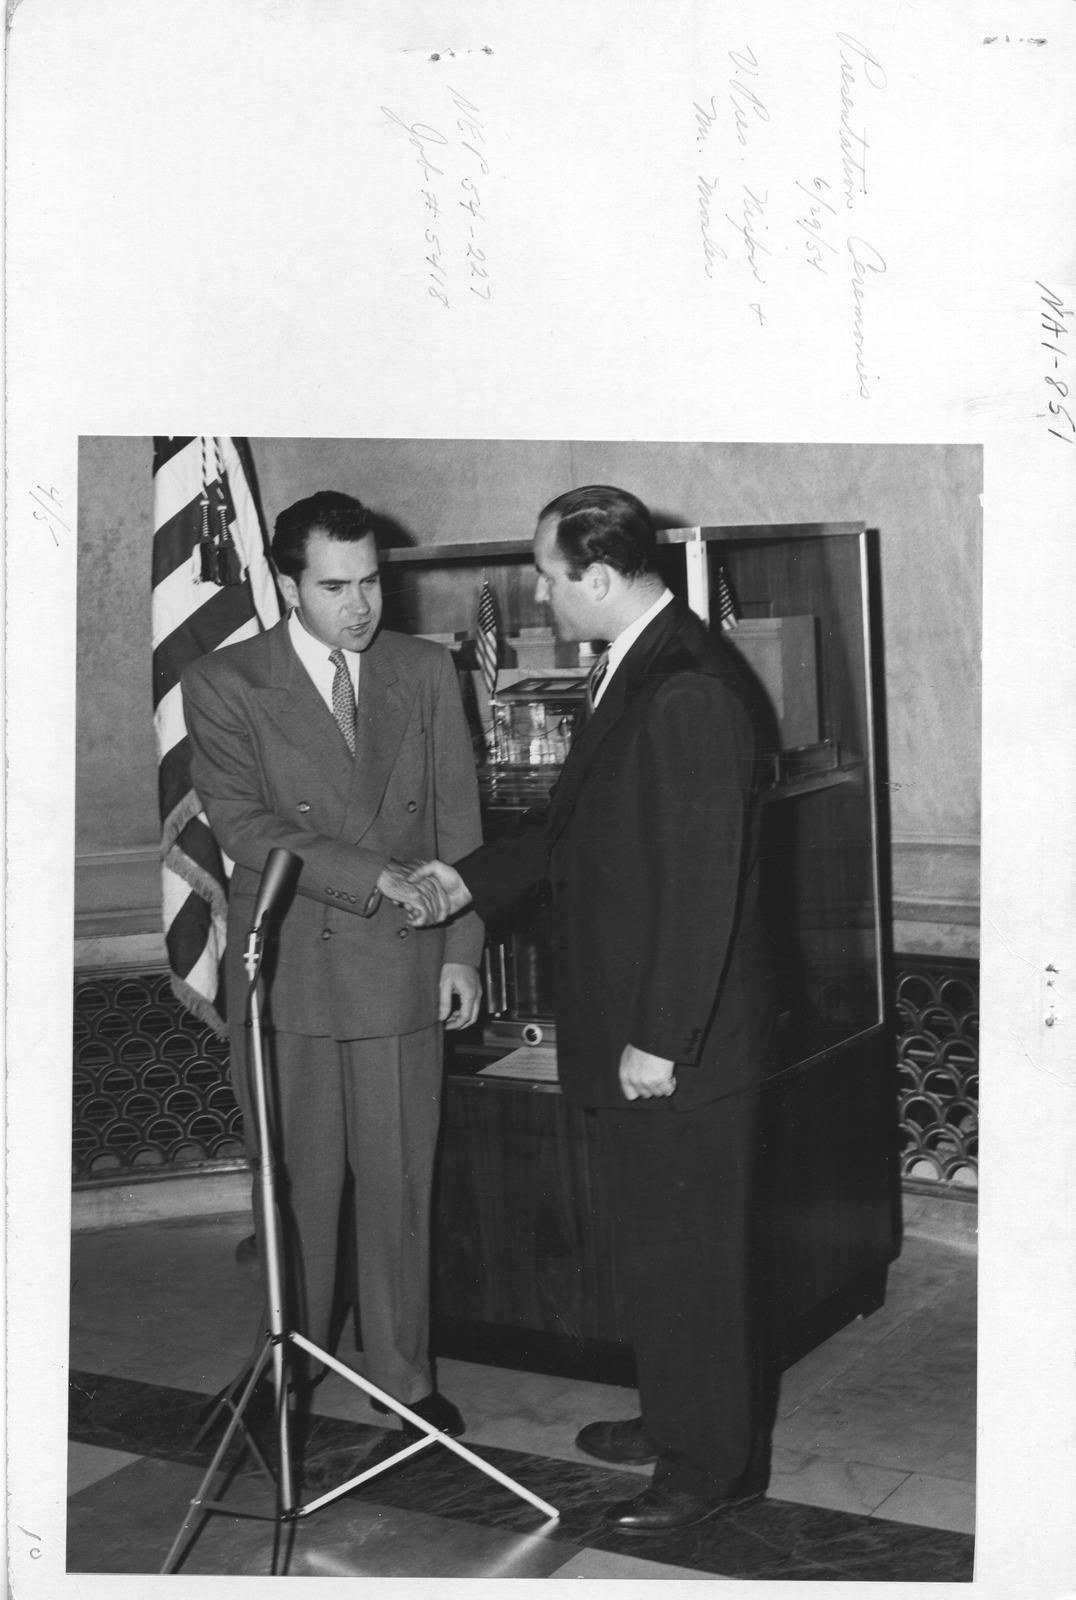 Photograph of Presentation Ceremonies, Vice President Richard Nixon and Mr. Mosler